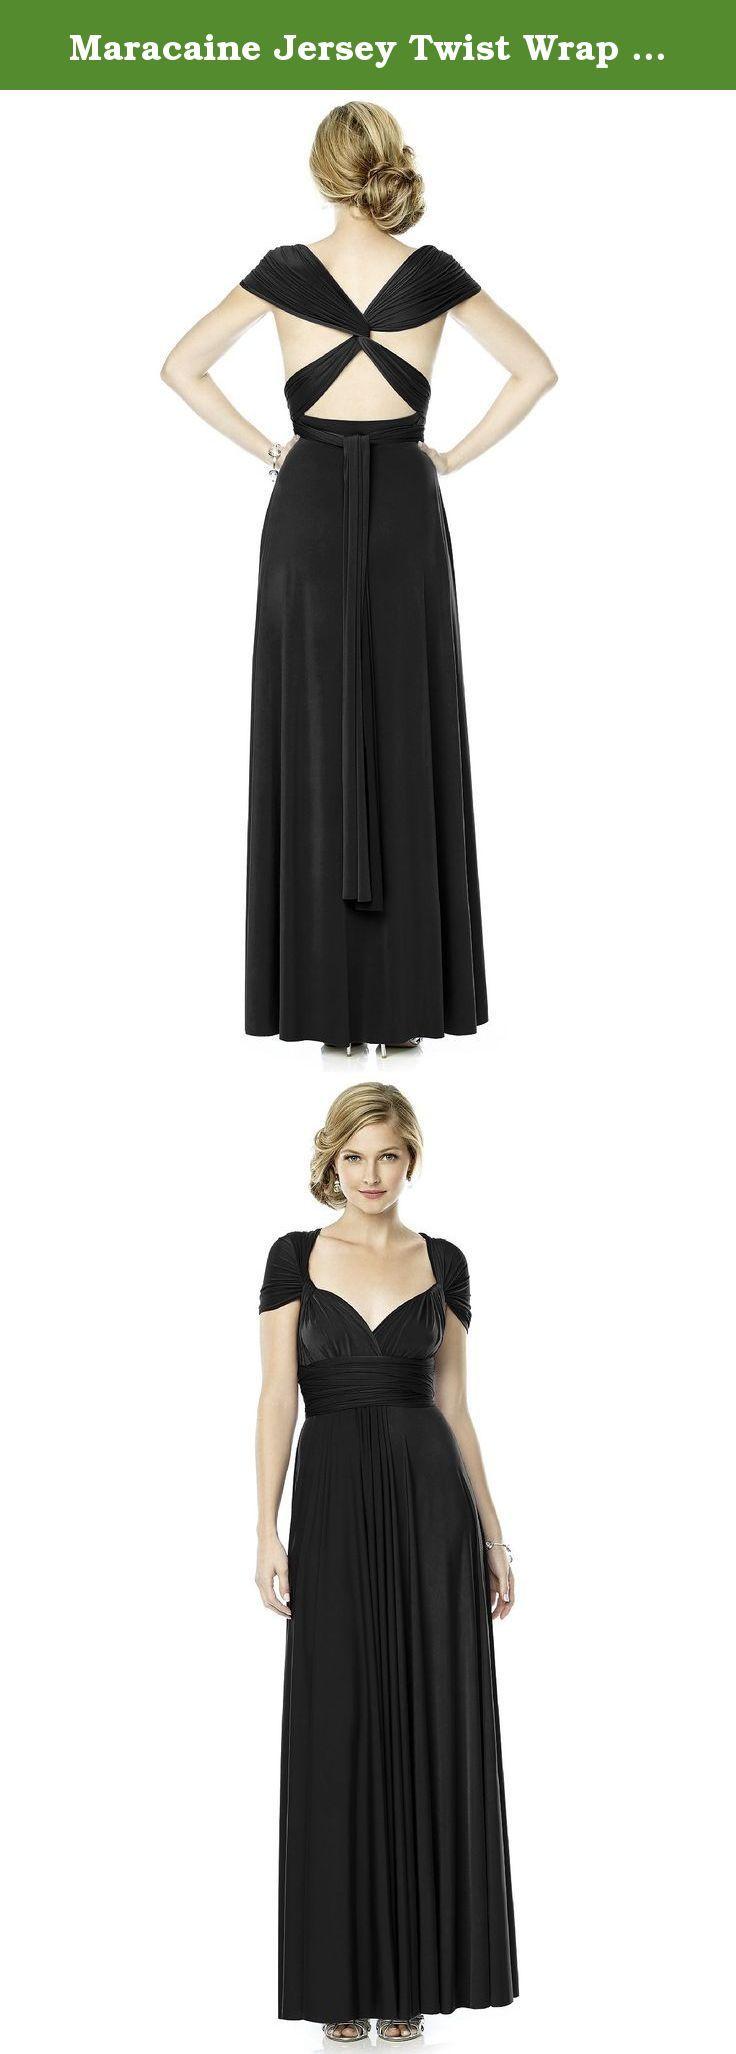 Maracaine jersey twist wrap dress long black size m the